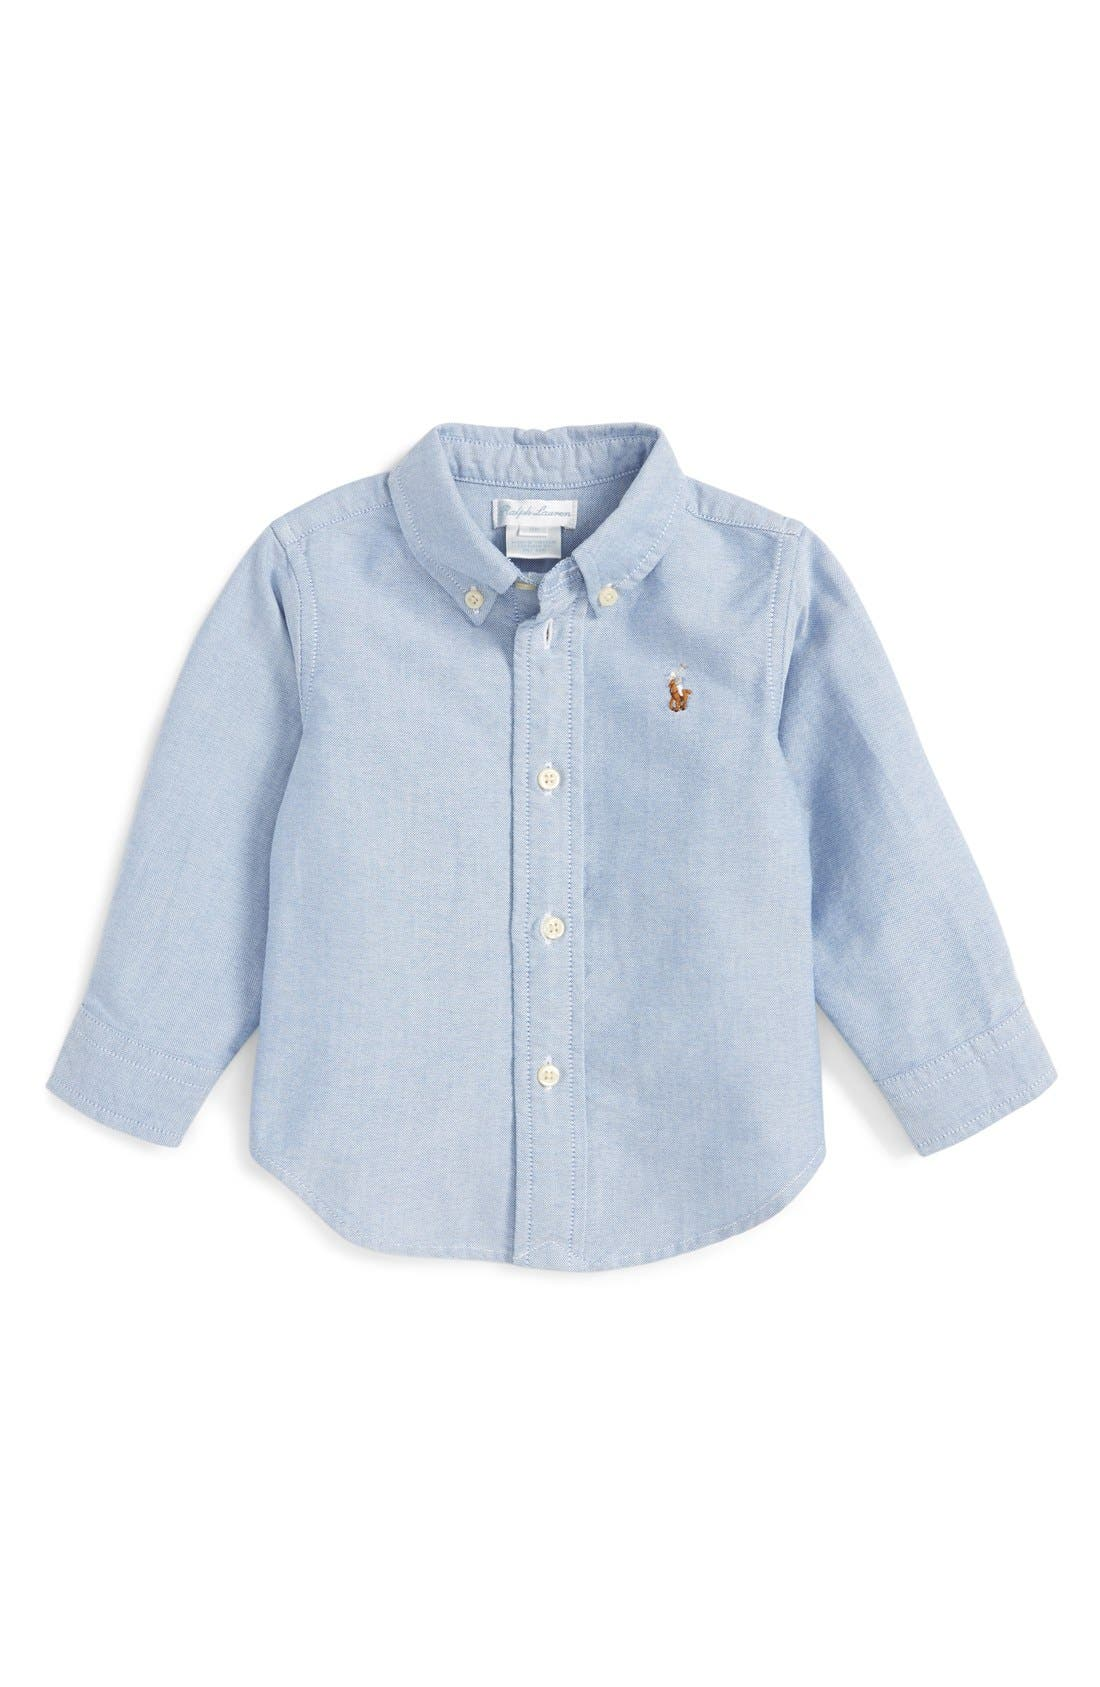 RALPH LAUREN Oxford Shirt, Main, color, 450